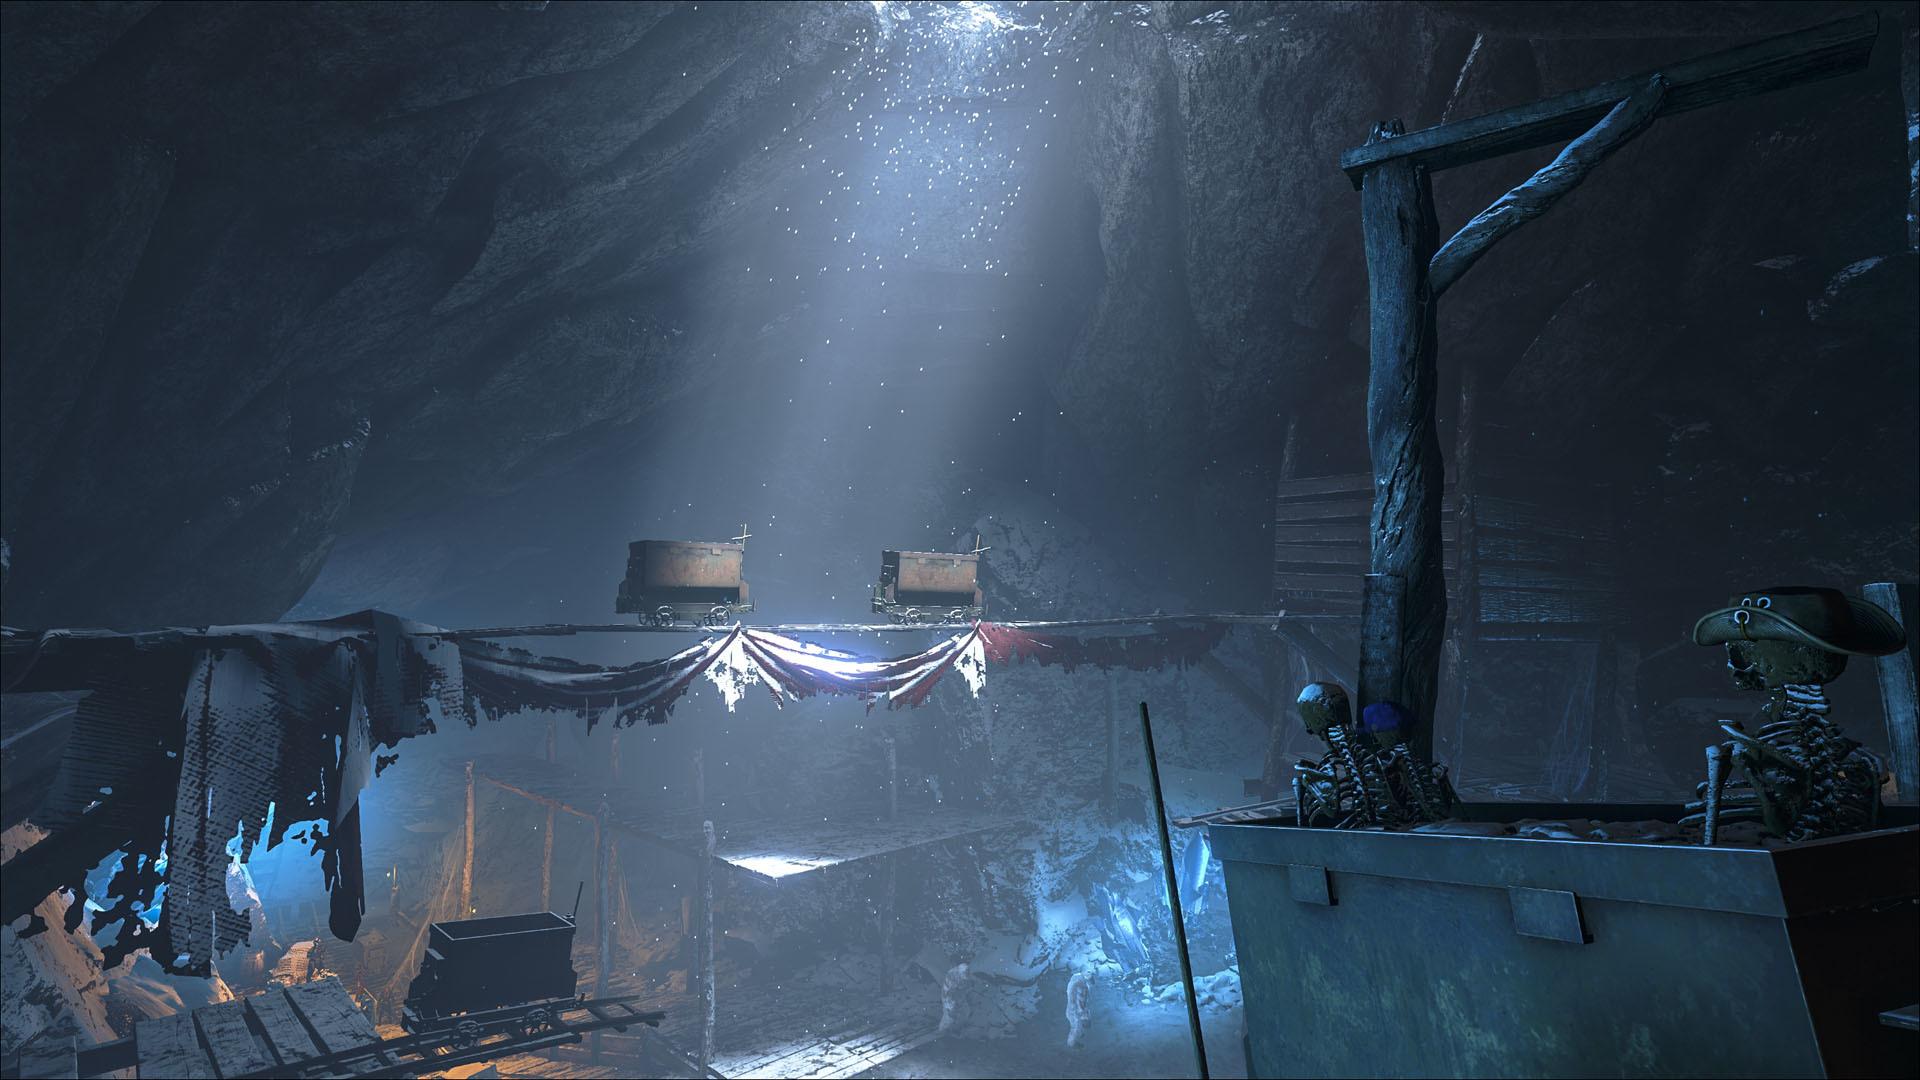 Watching Endless Armada Entering >> Atlas Steam De